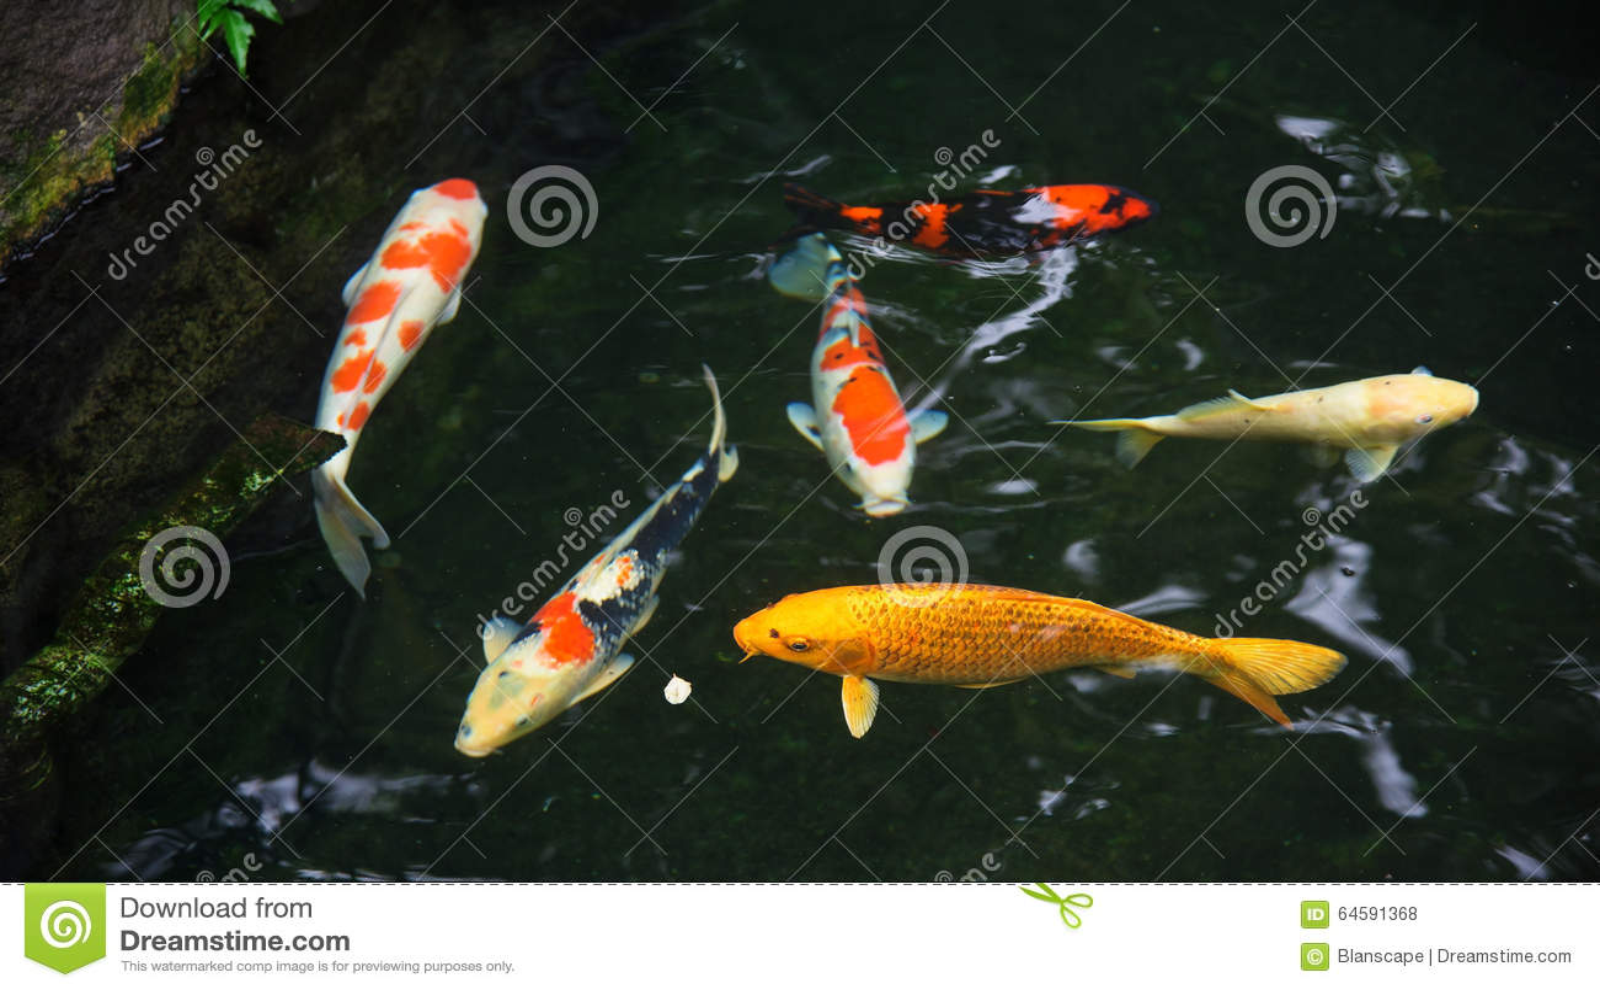 Feeding fancy carp fish stock photo for Fancy koi fish